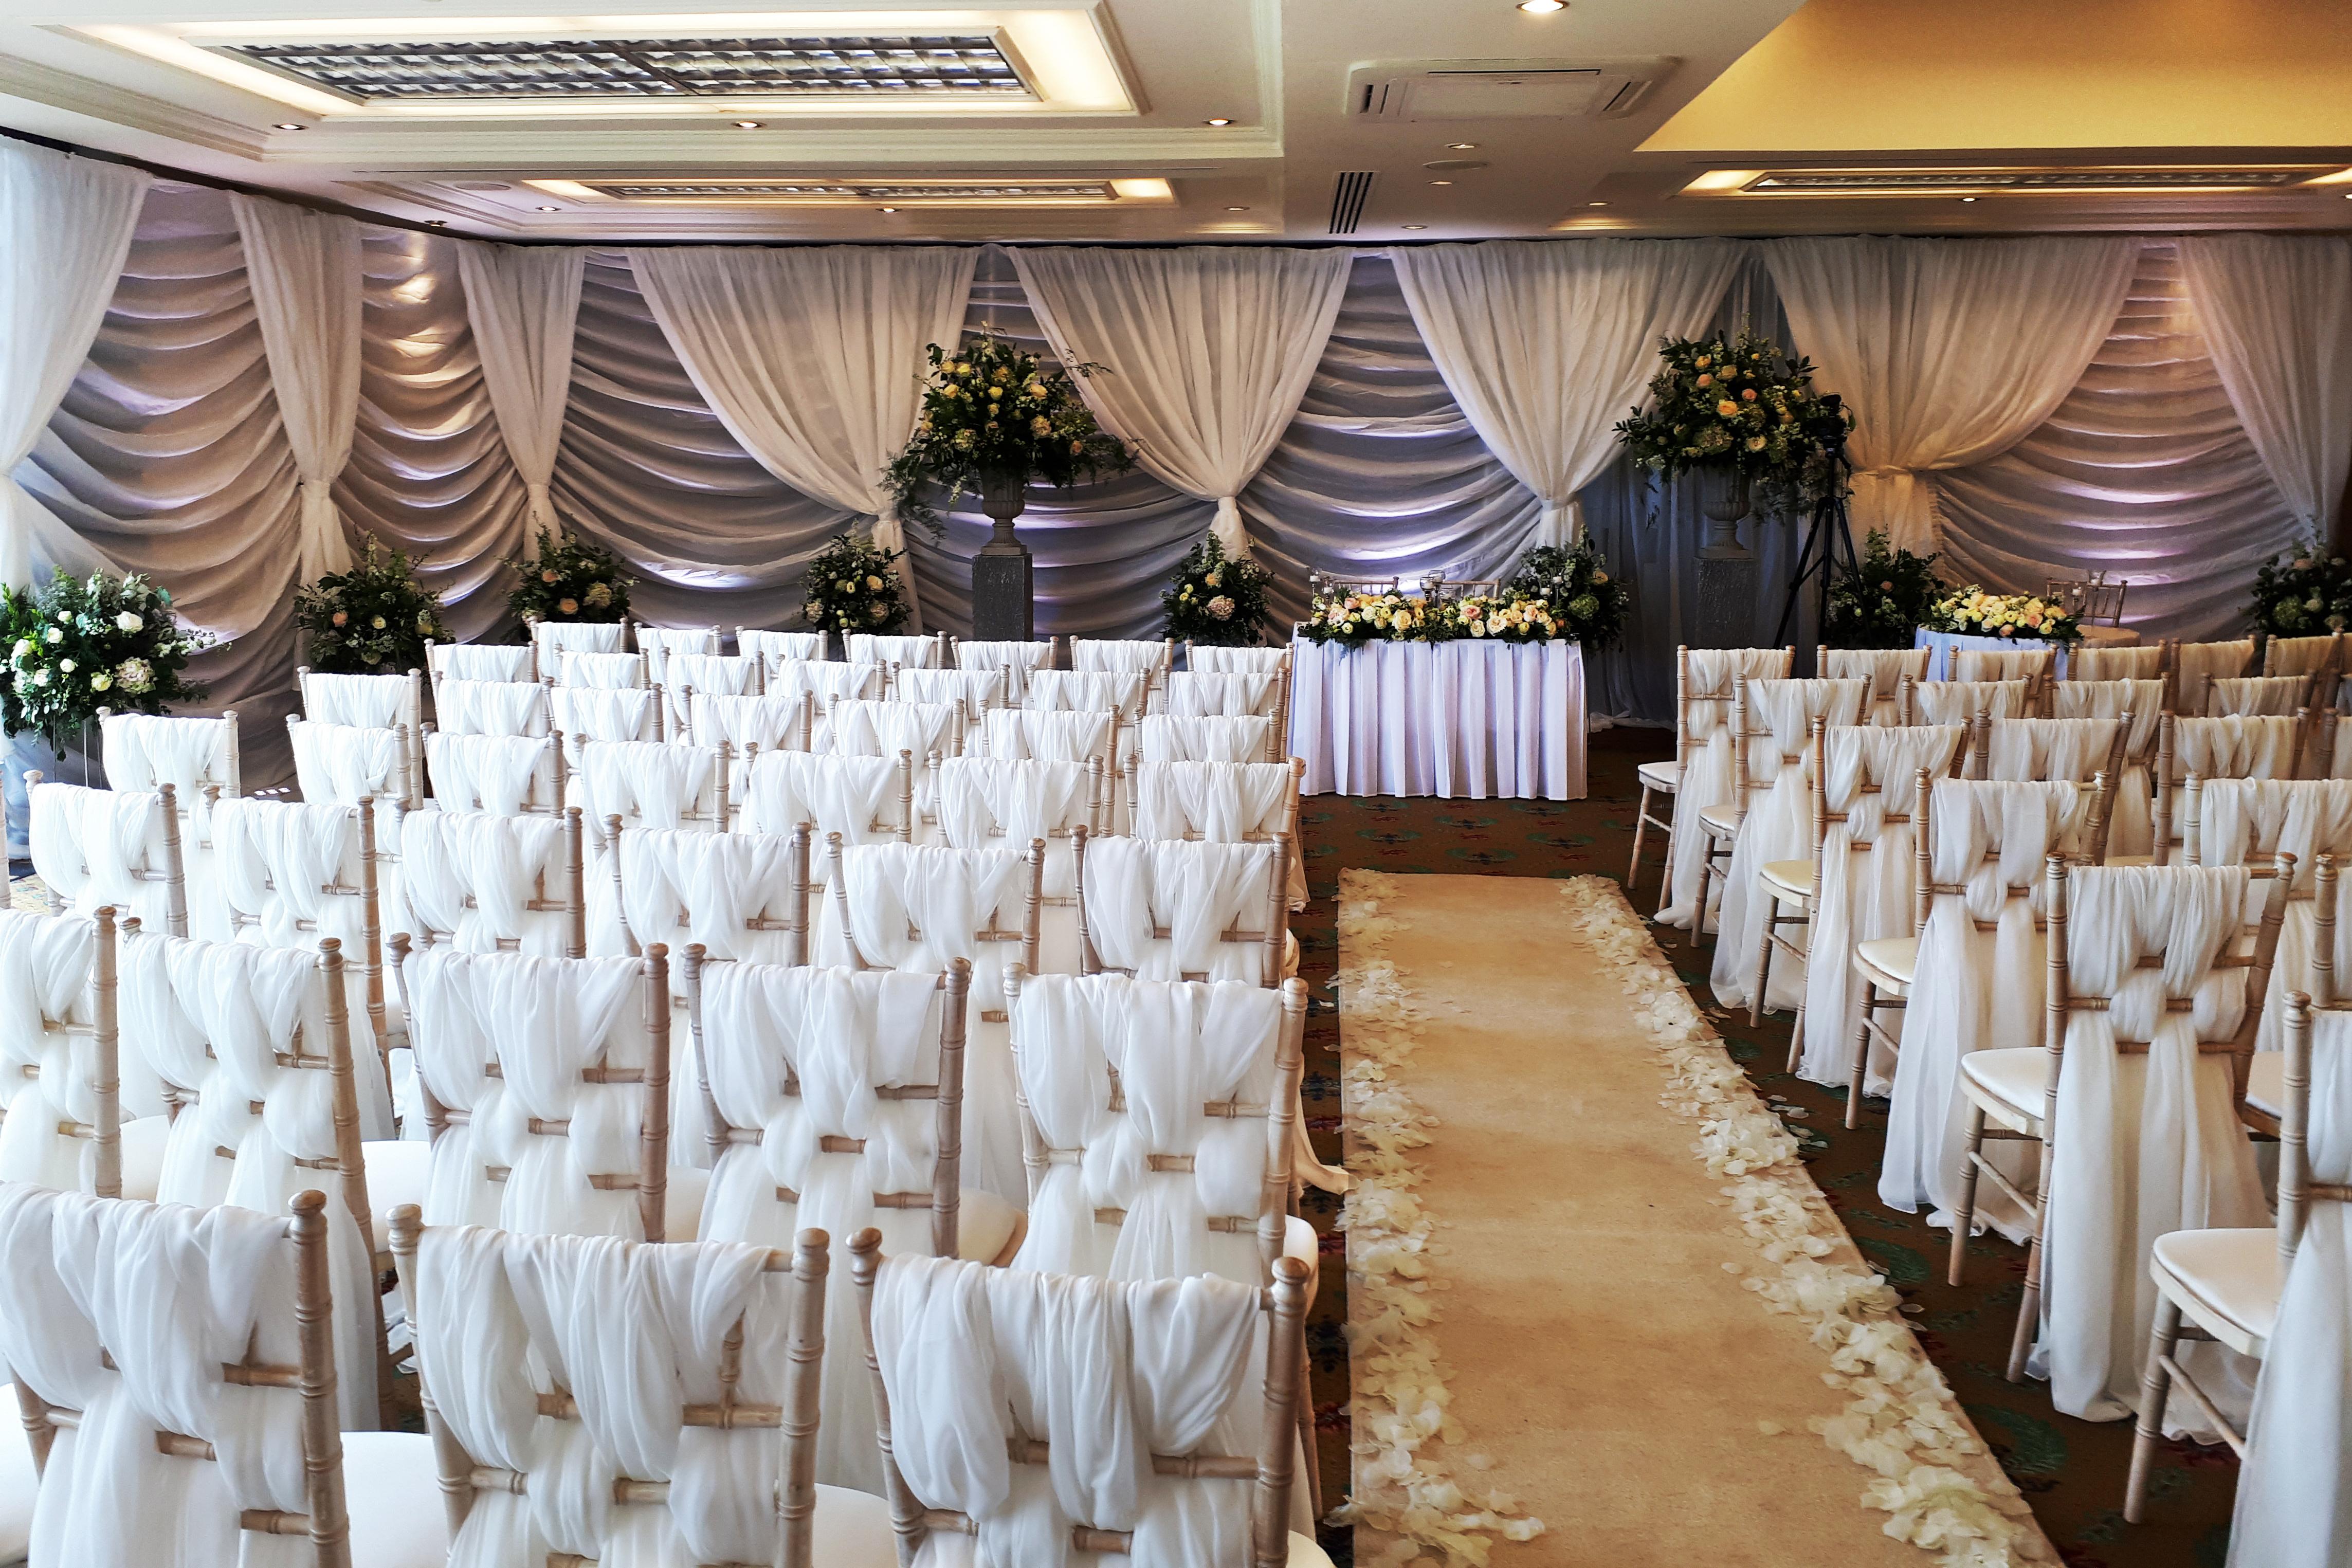 Wall drapes for weddings